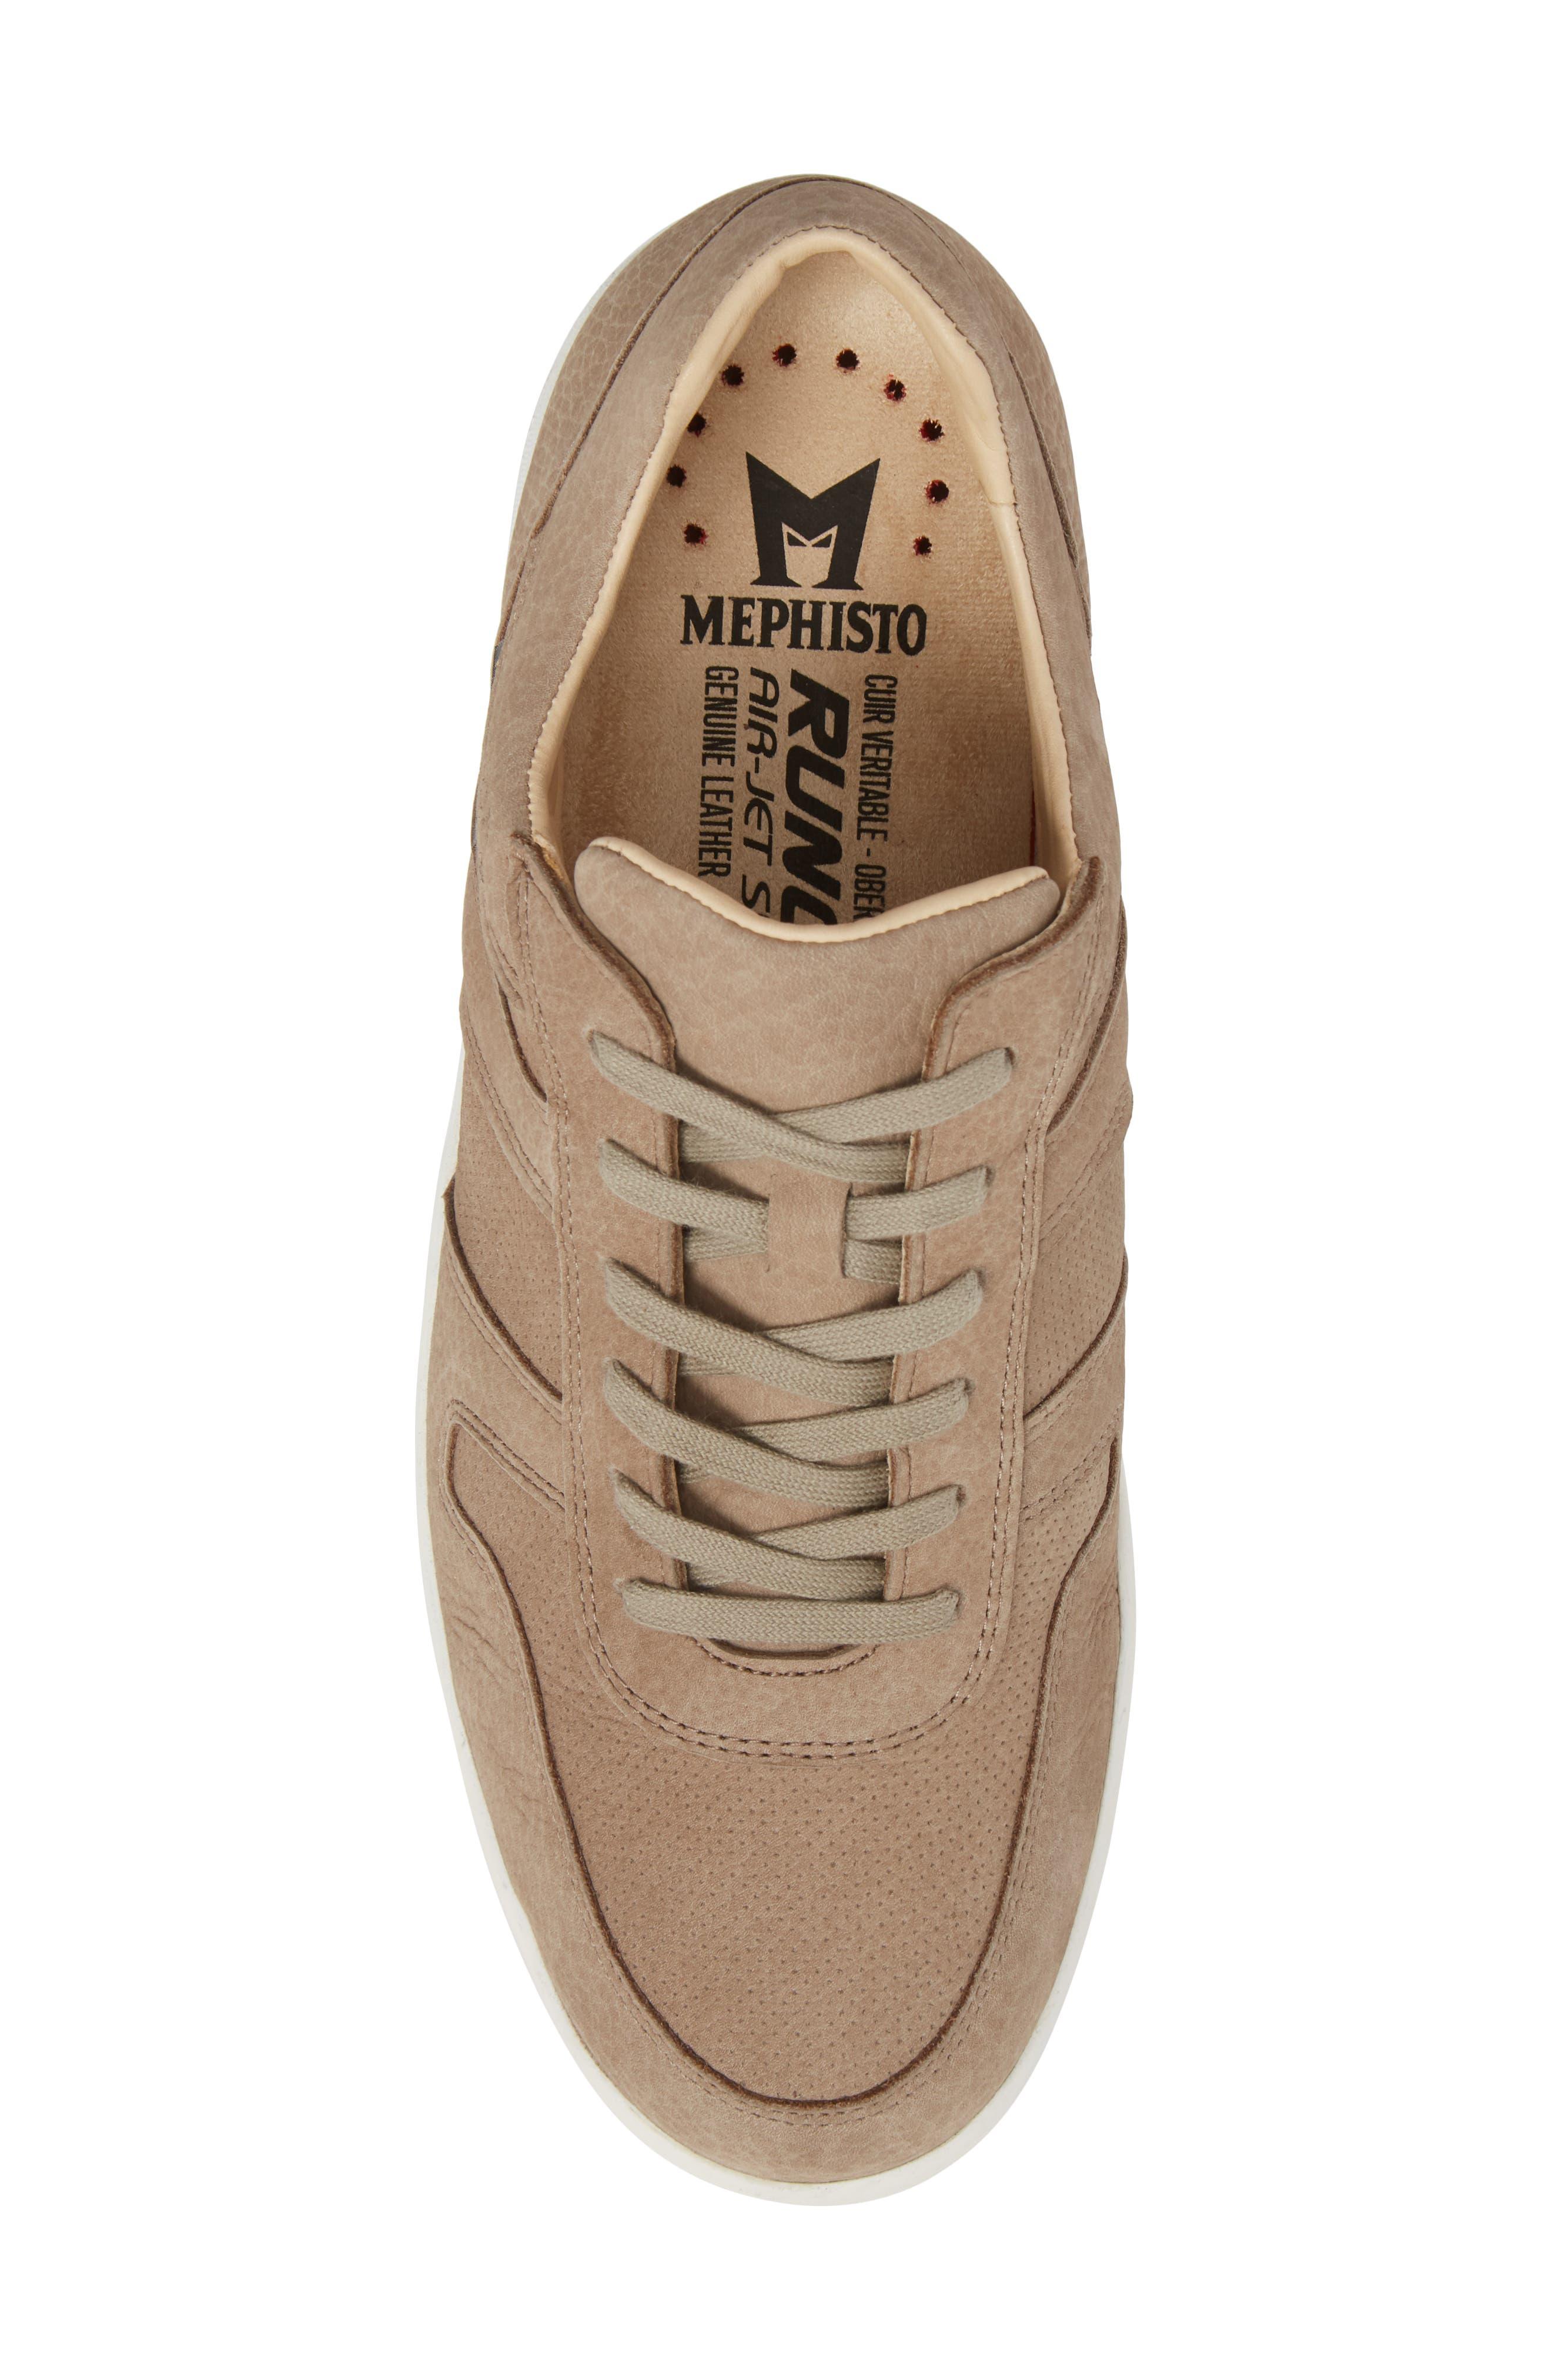 Vito Perforated Sneaker,                             Alternate thumbnail 5, color,                             281